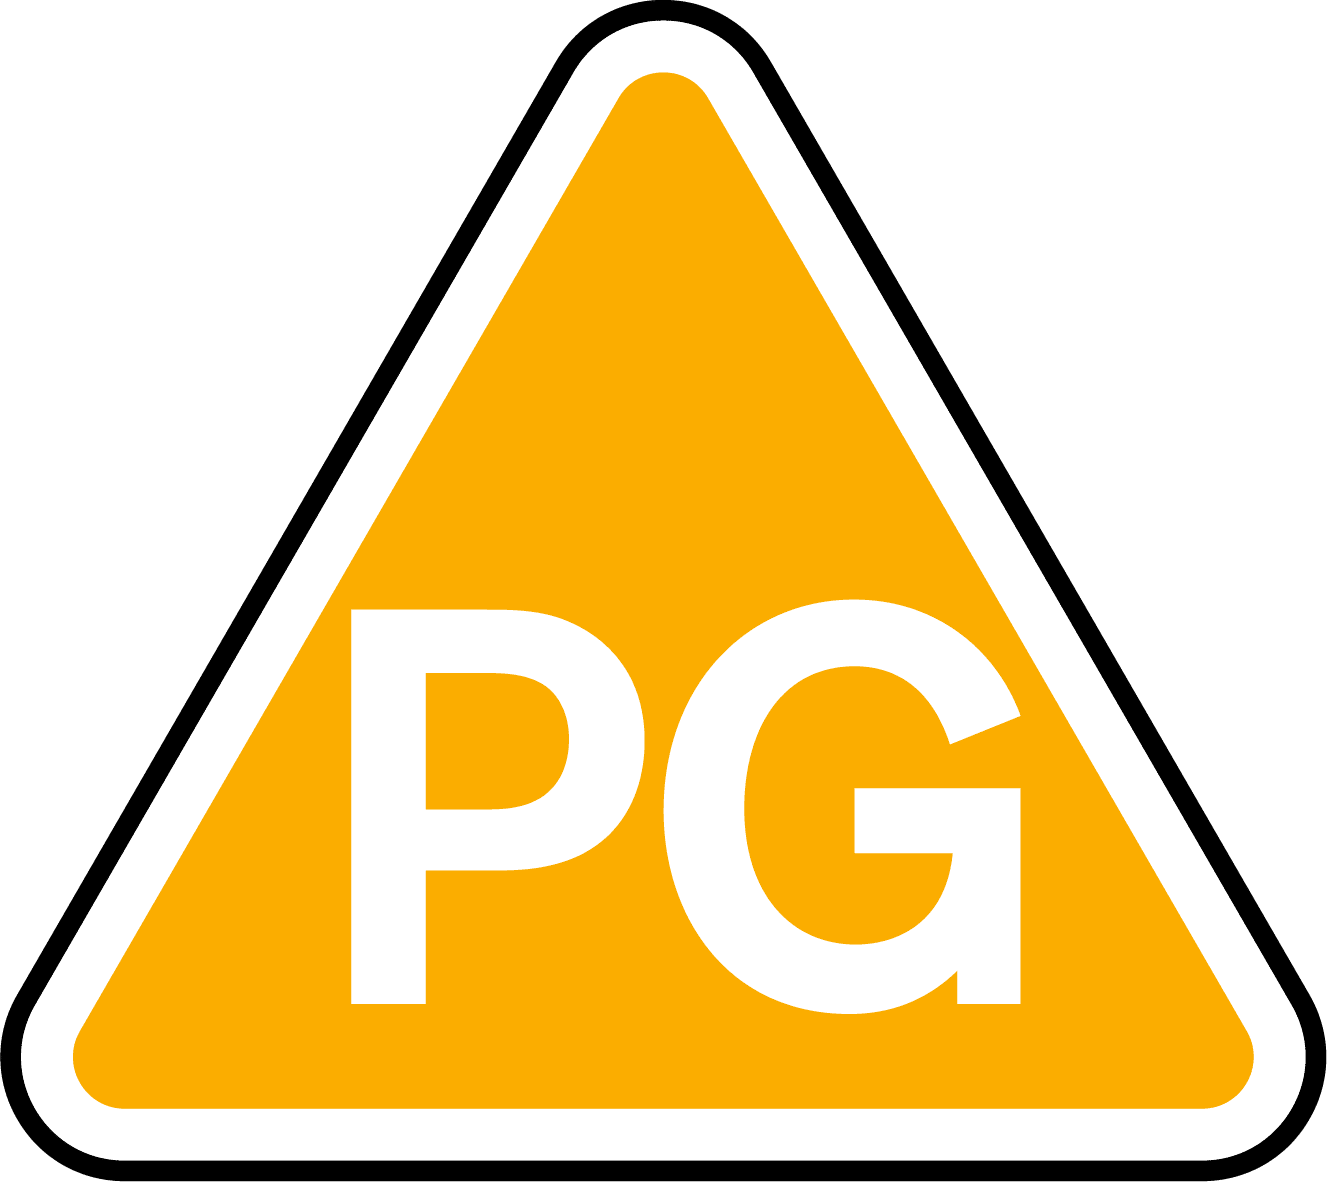 Certfication: PG